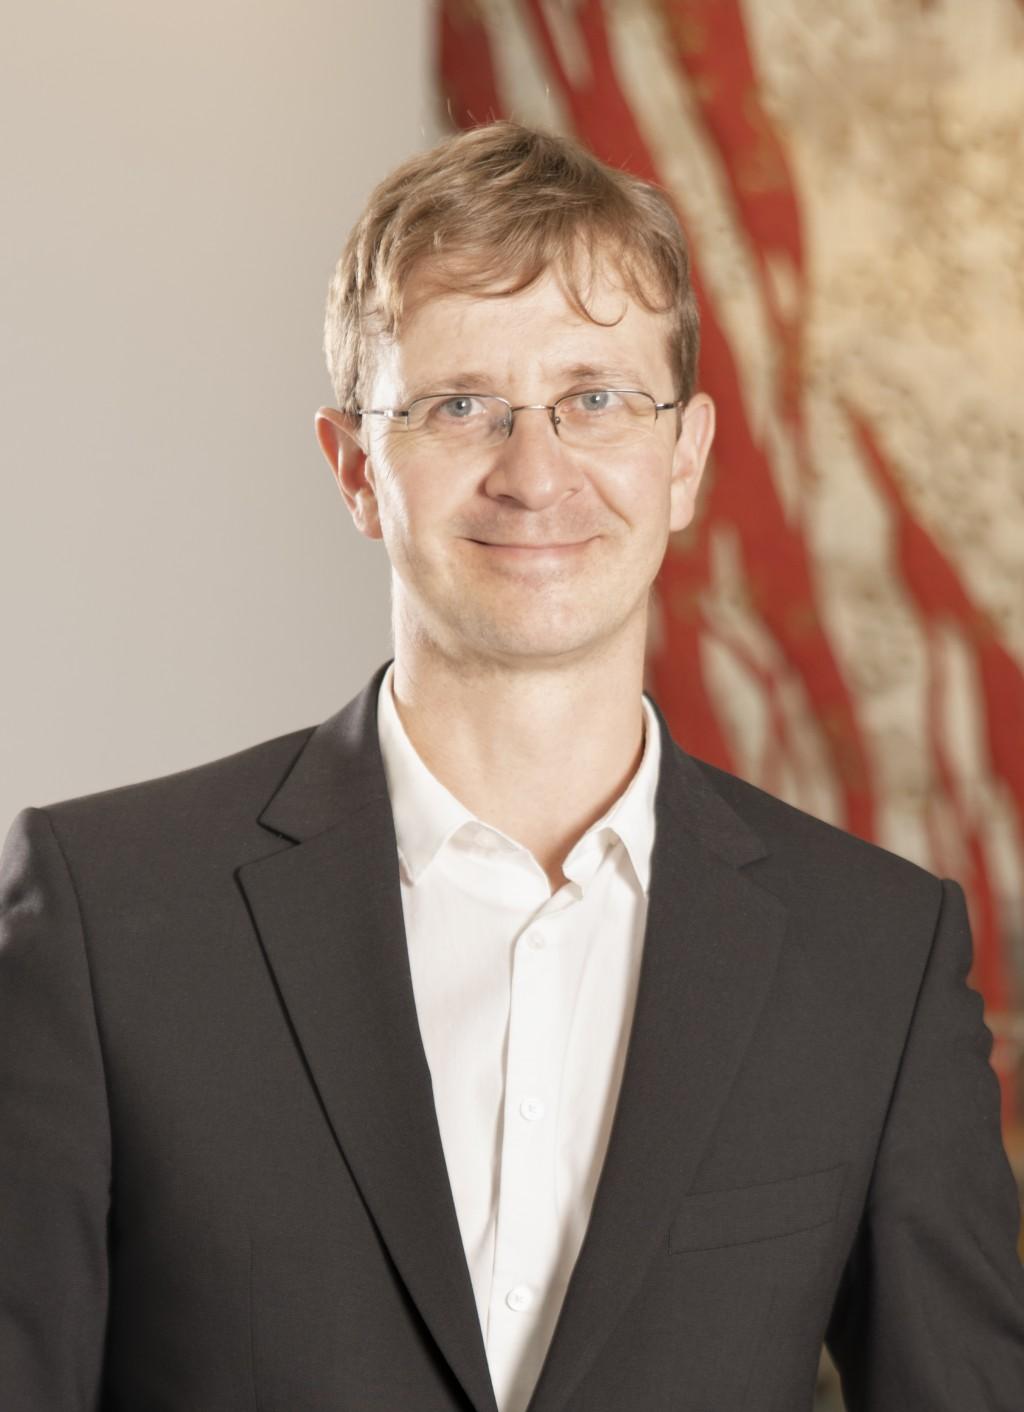 Matthias Wetzel